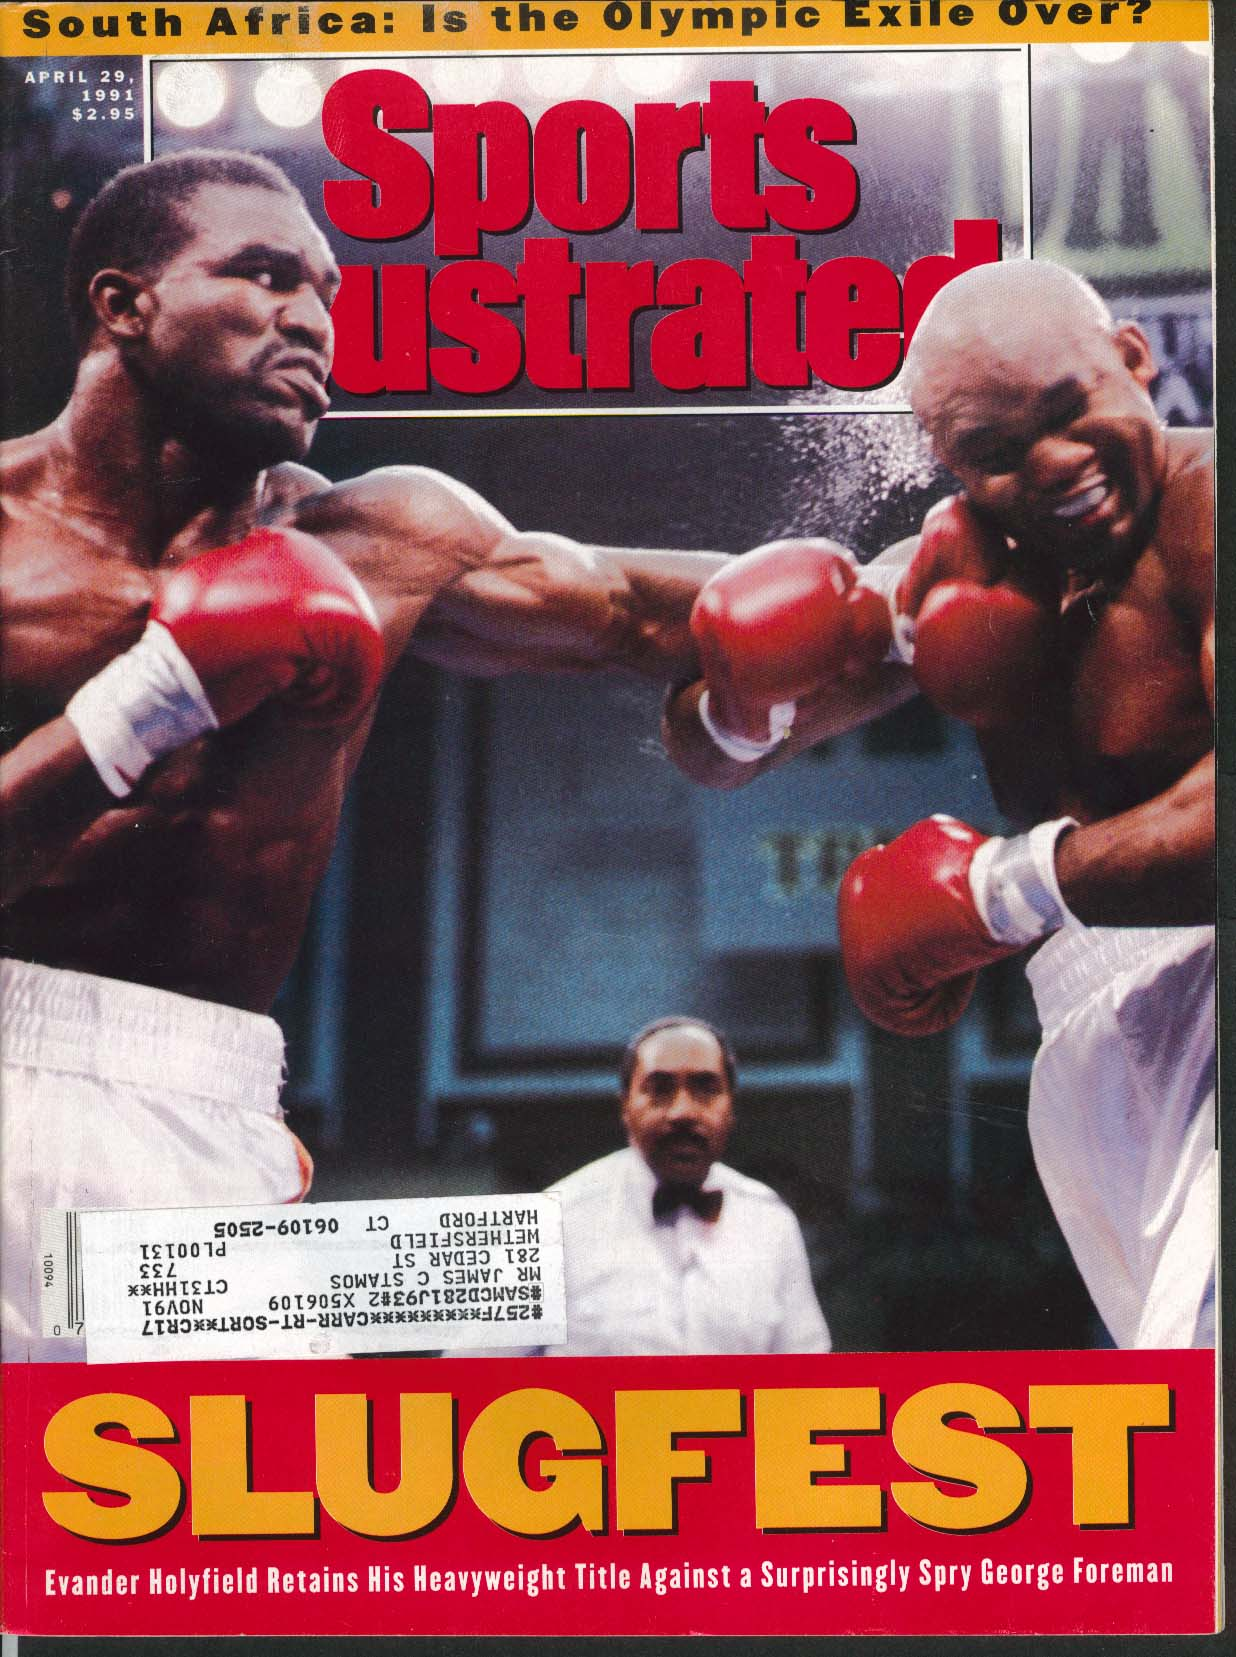 SPORTS ILLUSTRATED Evander Holyfield George Foreman Billie Jean King 4/29 1991